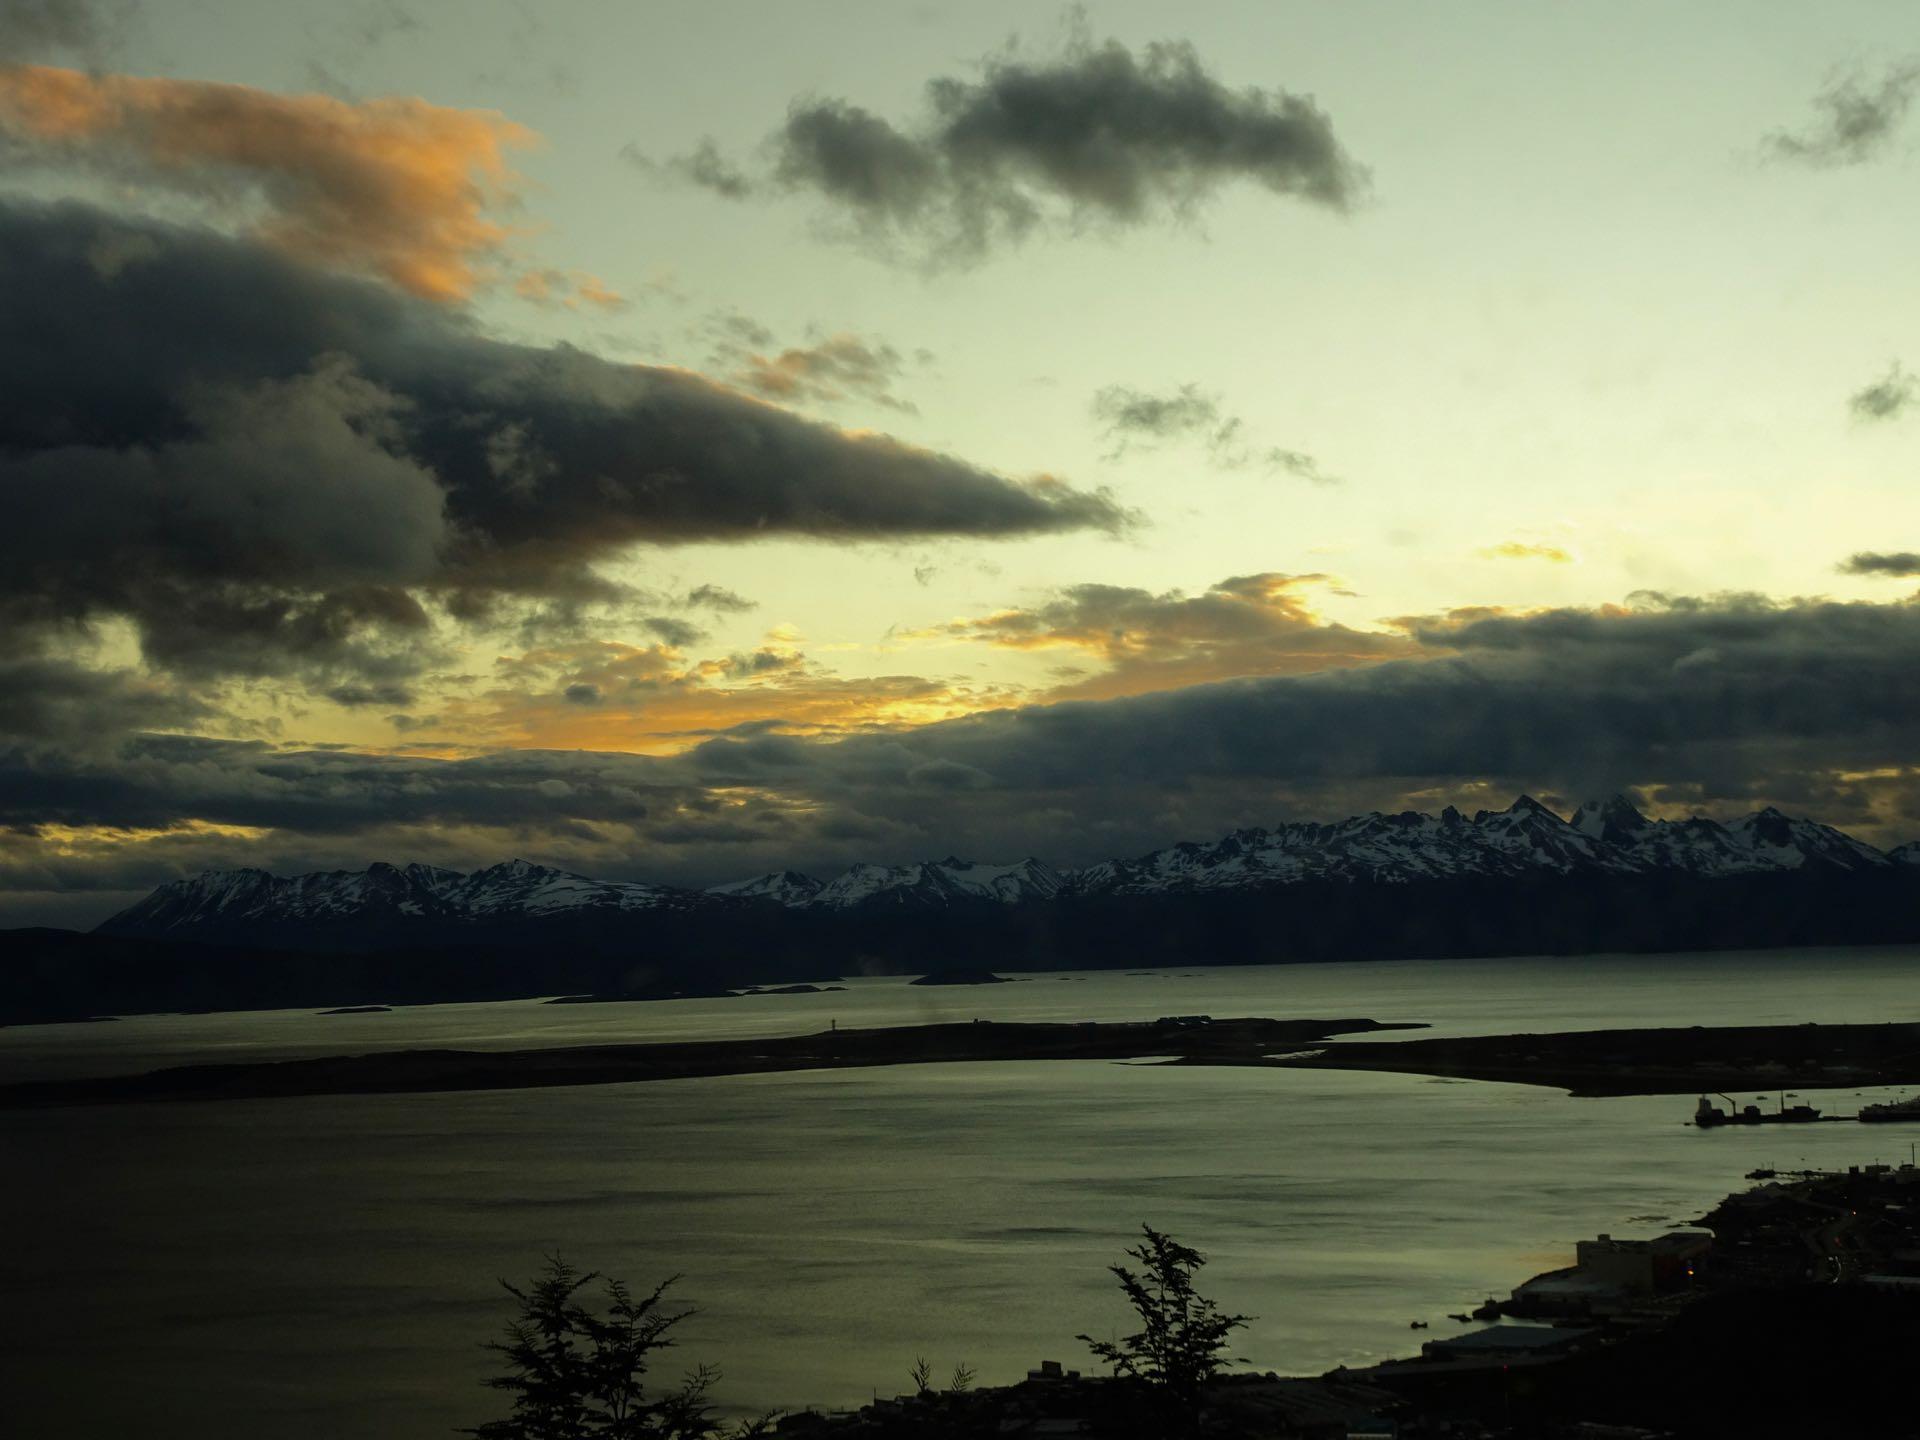 Dämmerung über Ushuaia